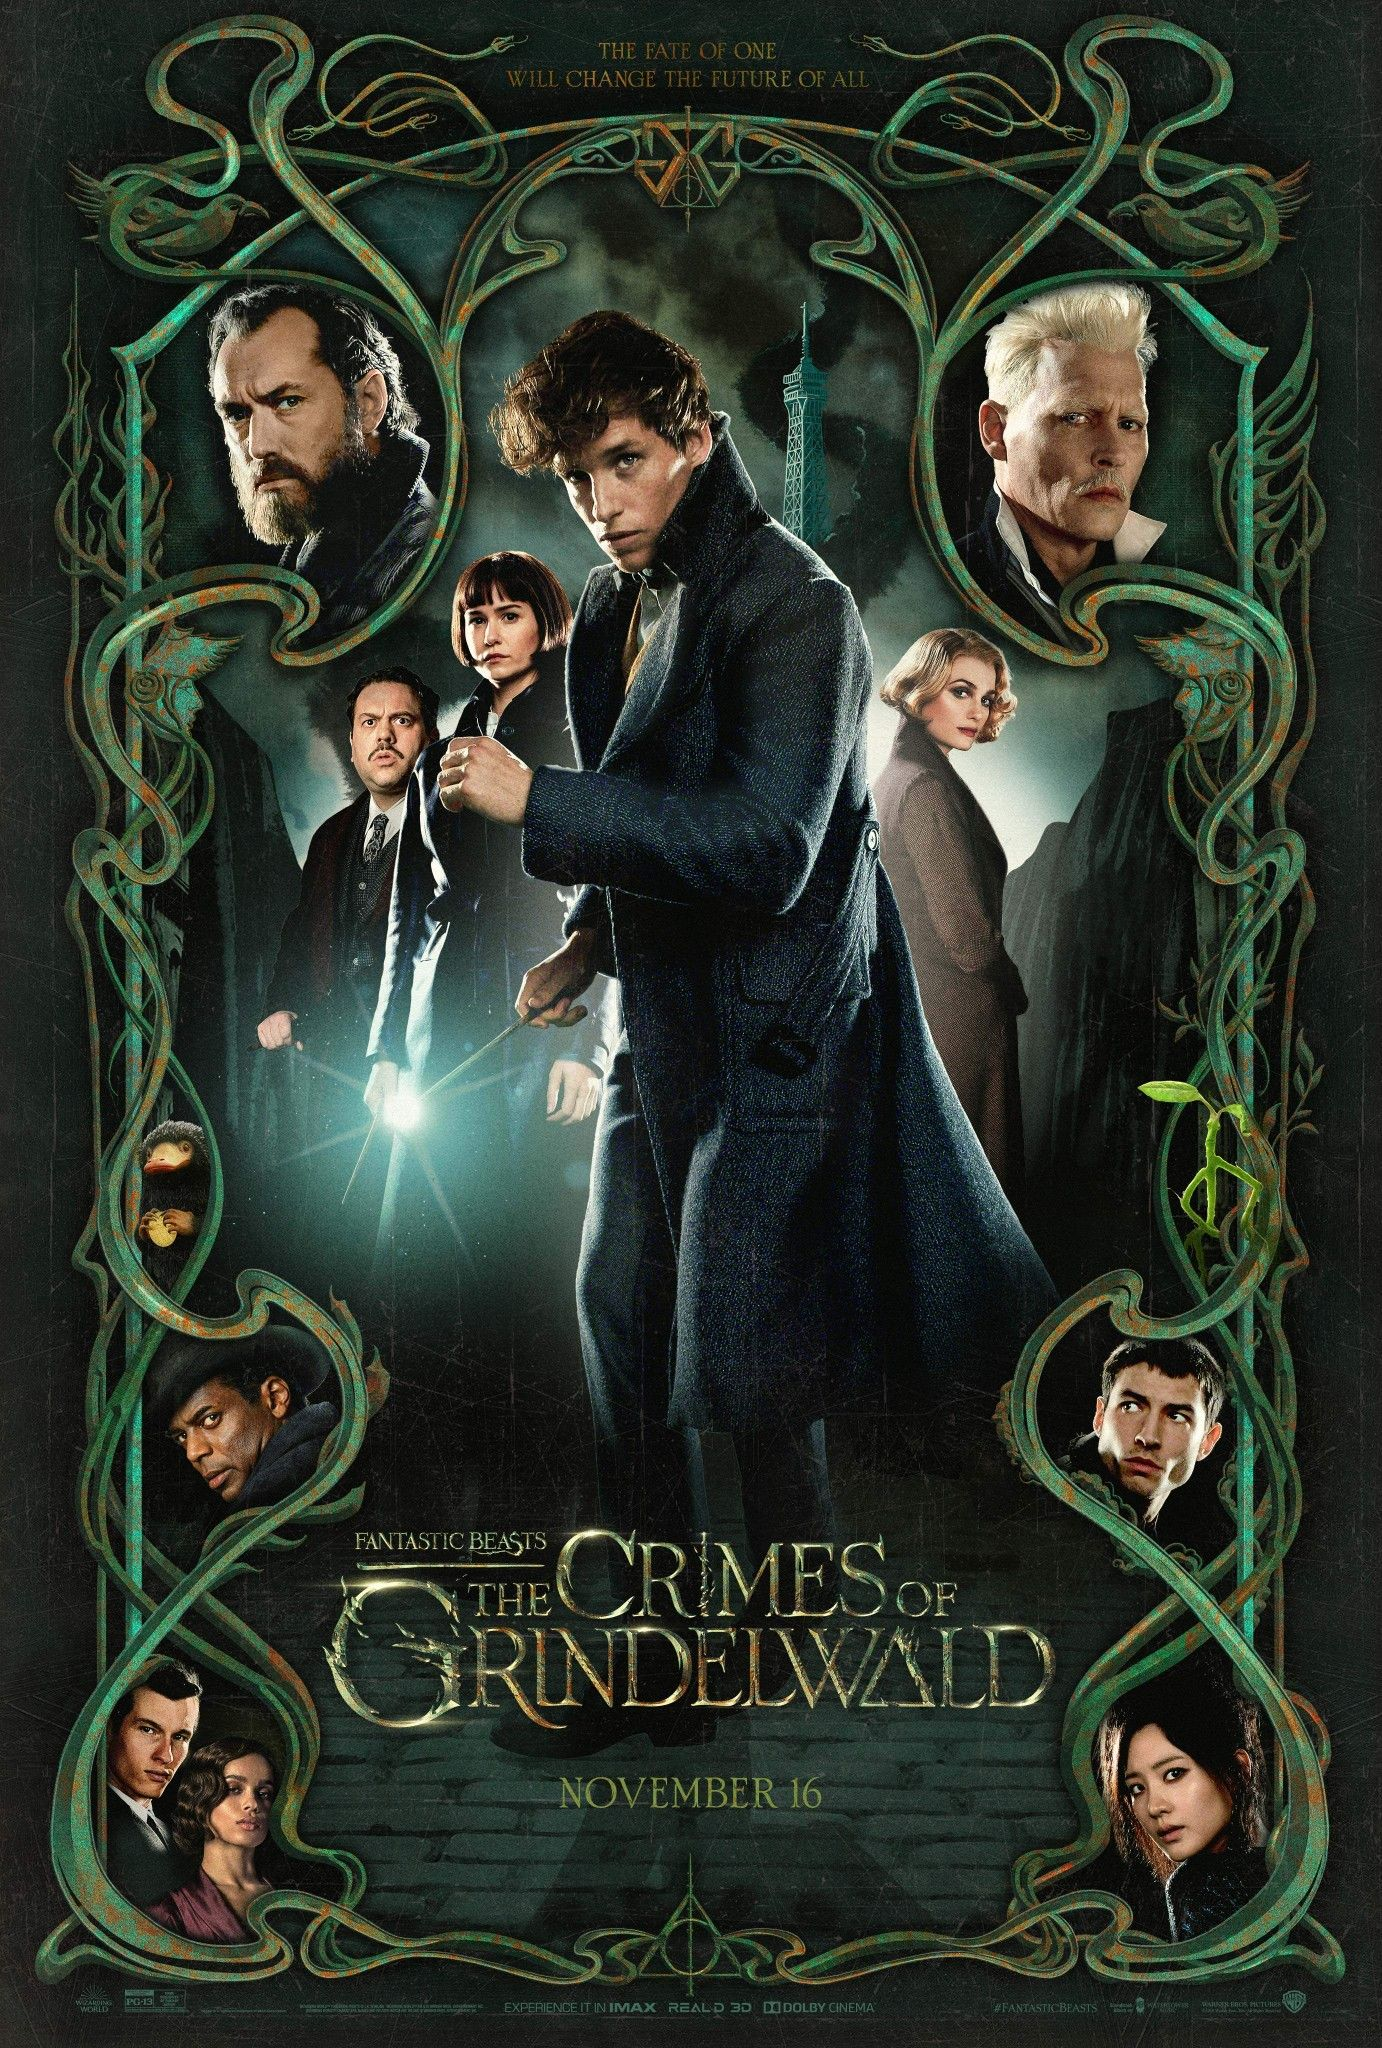 Pin De Anderson Tavares Em Harry Potter Bestas Fantasticas